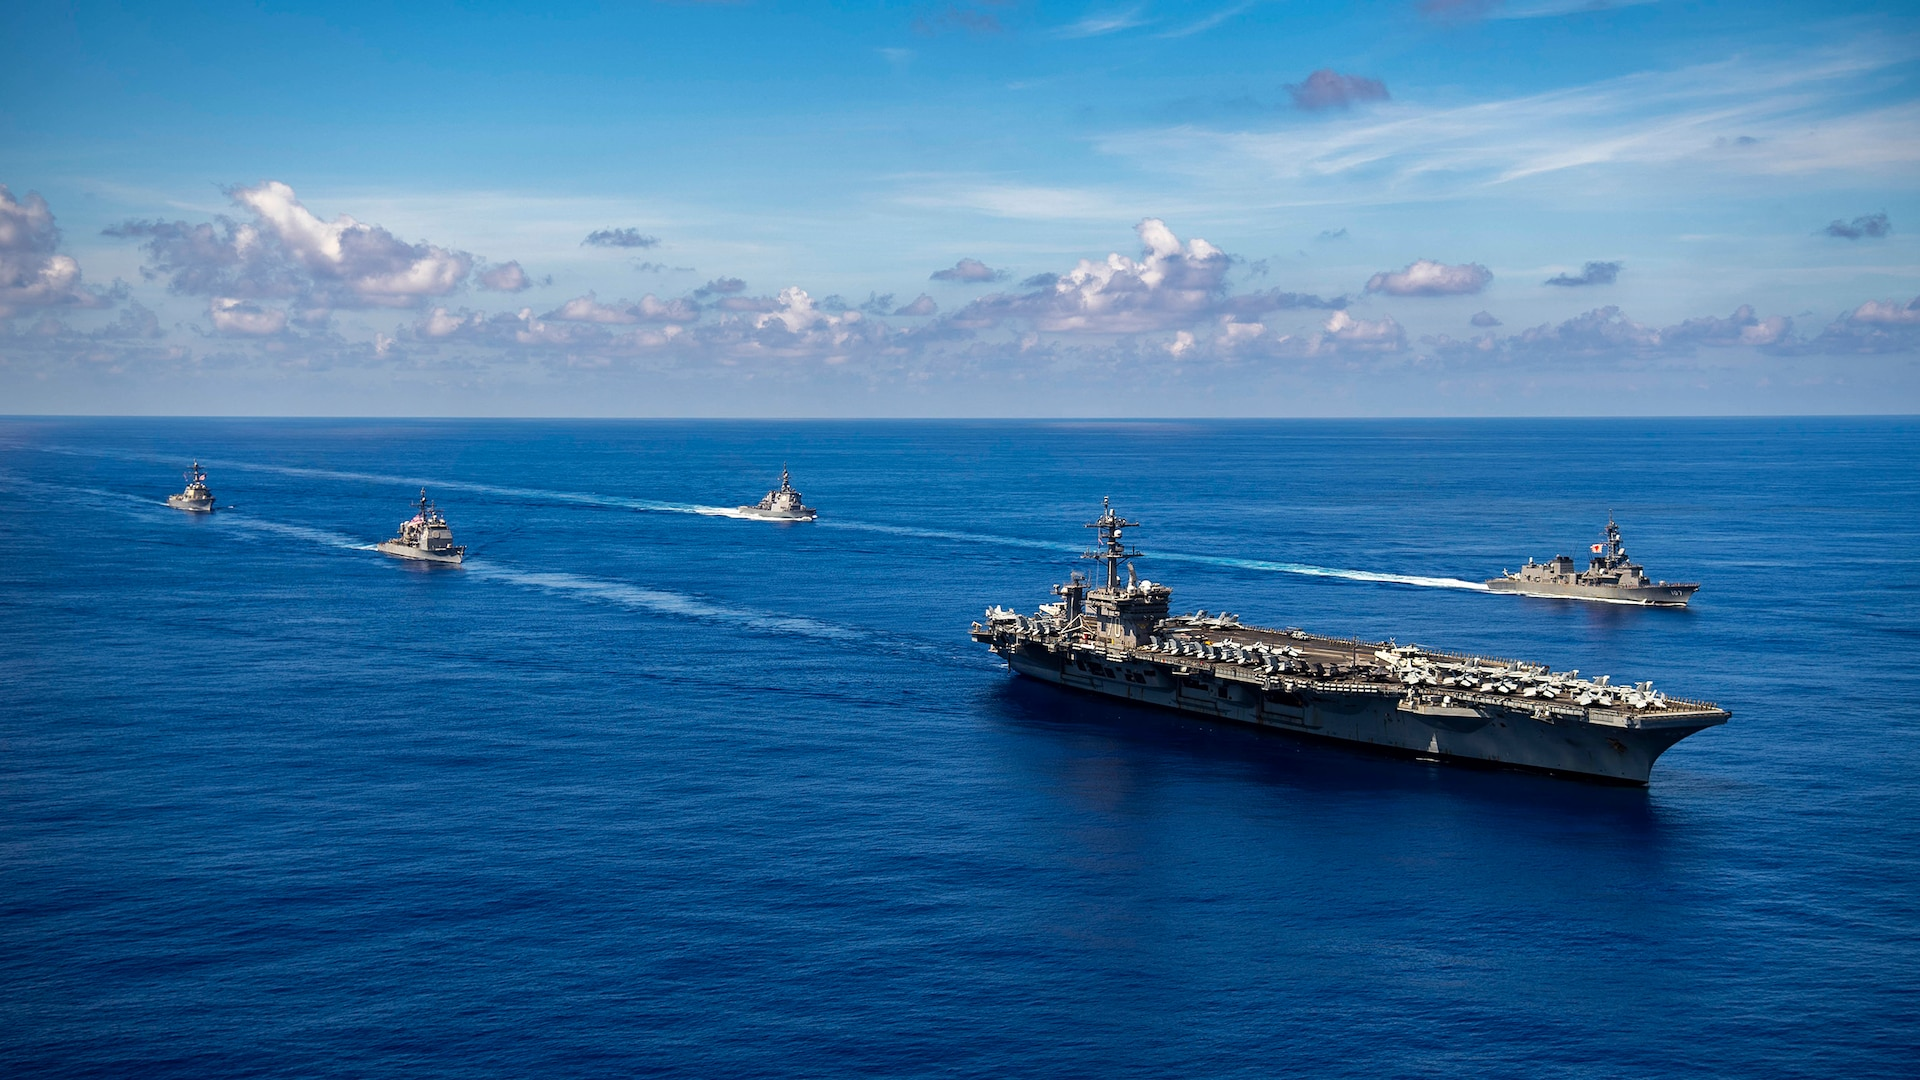 Japan Maritime Self-Defense Force, U.S. Carrier Strike Group 1 Complete Bilateral Exercise